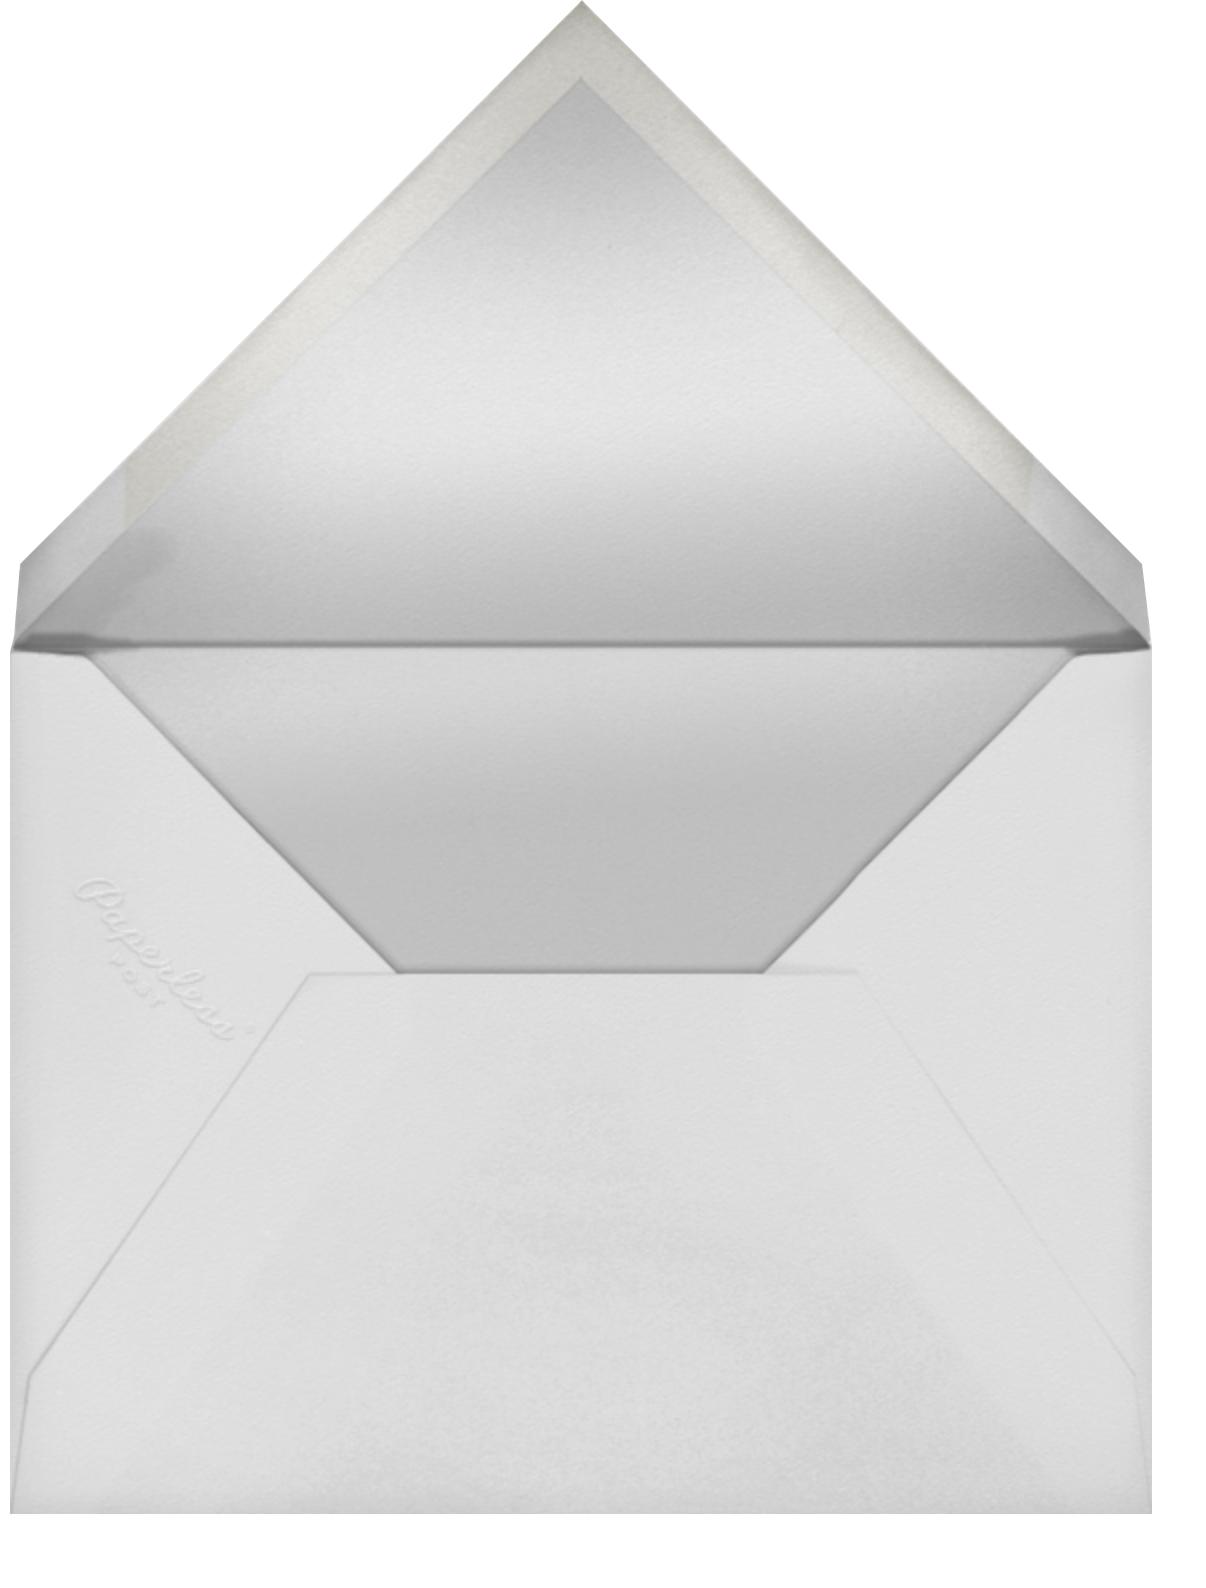 Betsy (Menu) - Red - Liberty - Menus - envelope back